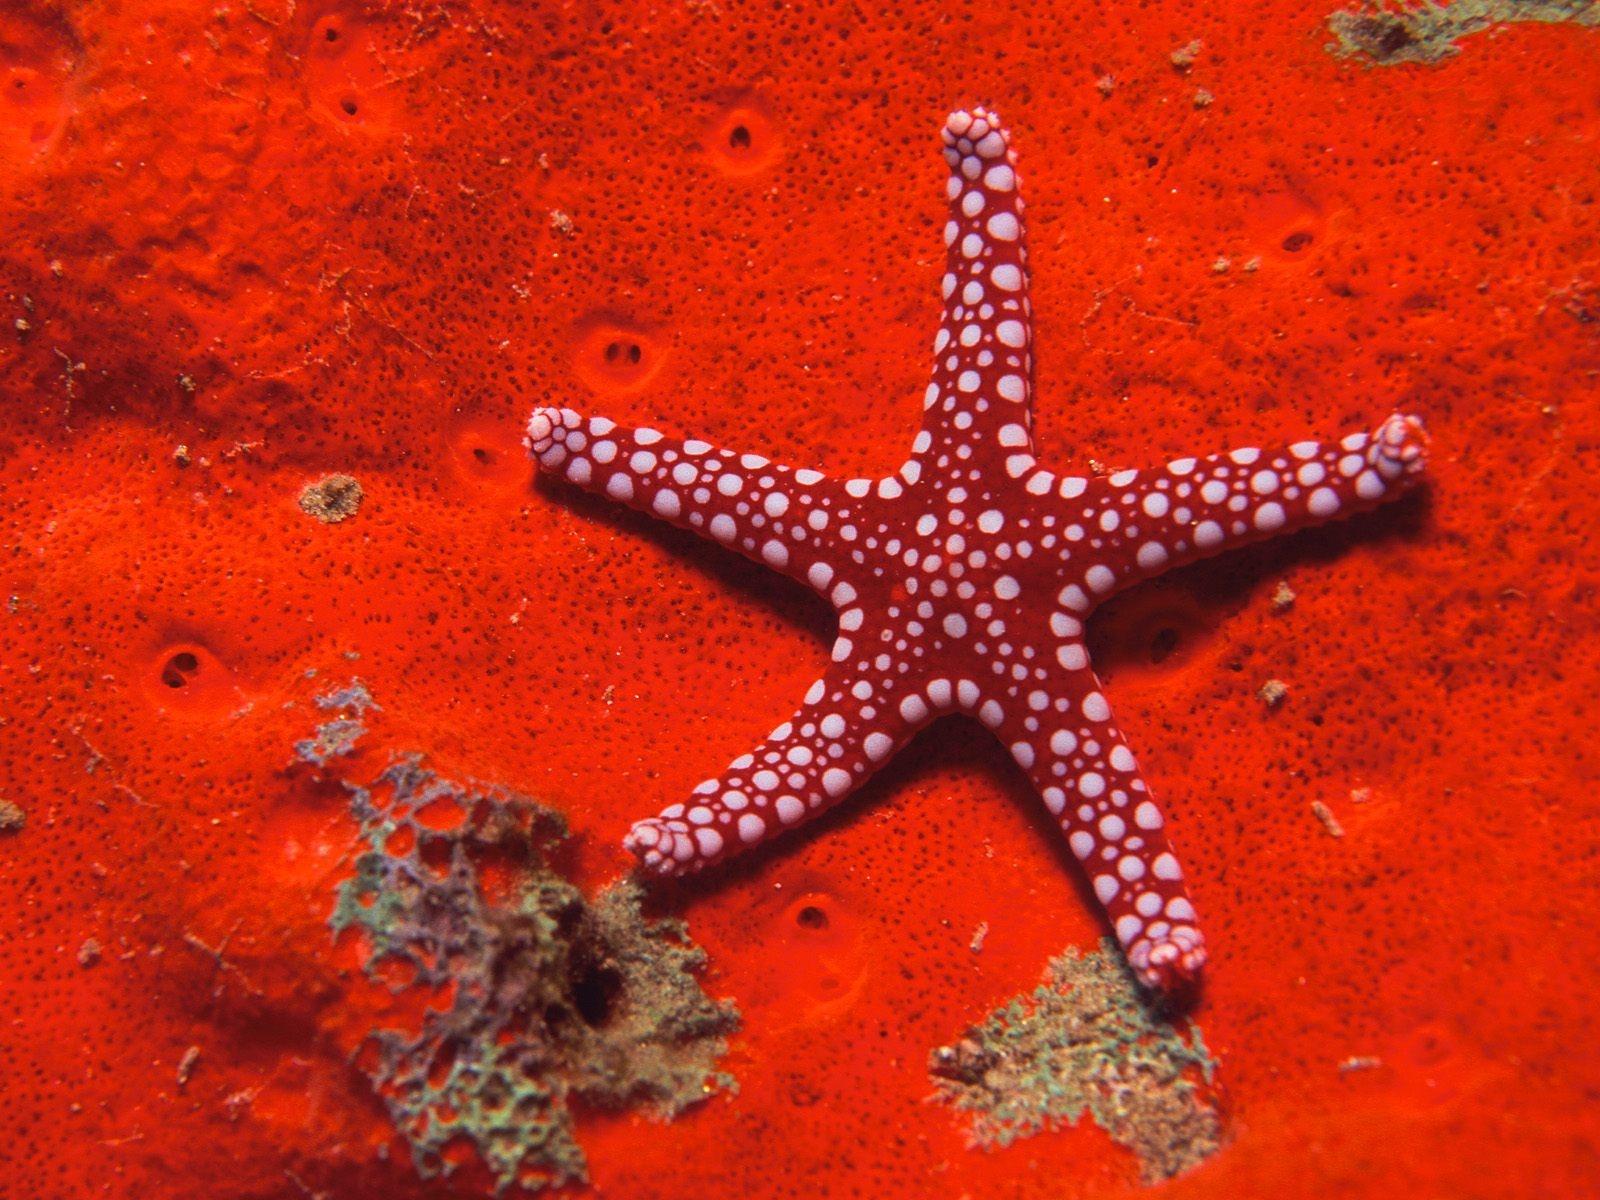 http://4.bp.blogspot.com/-bwwKWLwgewc/TclaSoPGVbI/AAAAAAAABz8/AMIkkCpHtJQ/s1600/ws_Red_Starfish_1600x1200.jpg